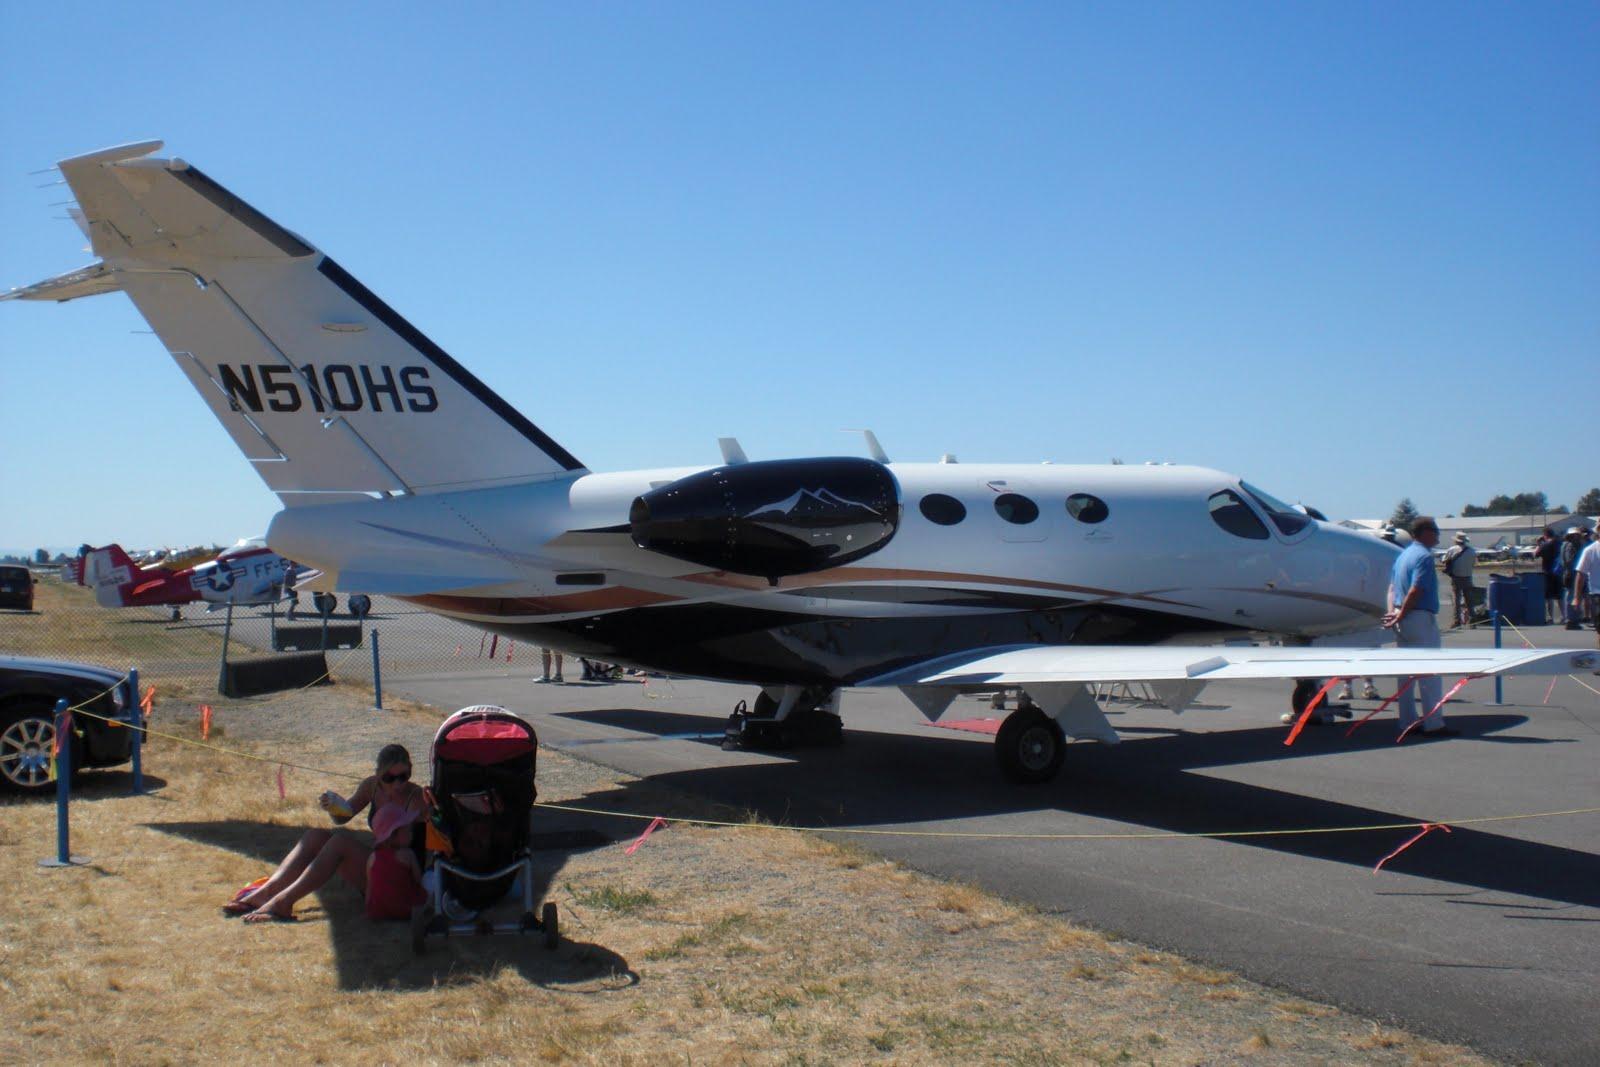 WORDS & WINGS: 2010 Cessna 510 Citation Mustang, c/n 510-0320